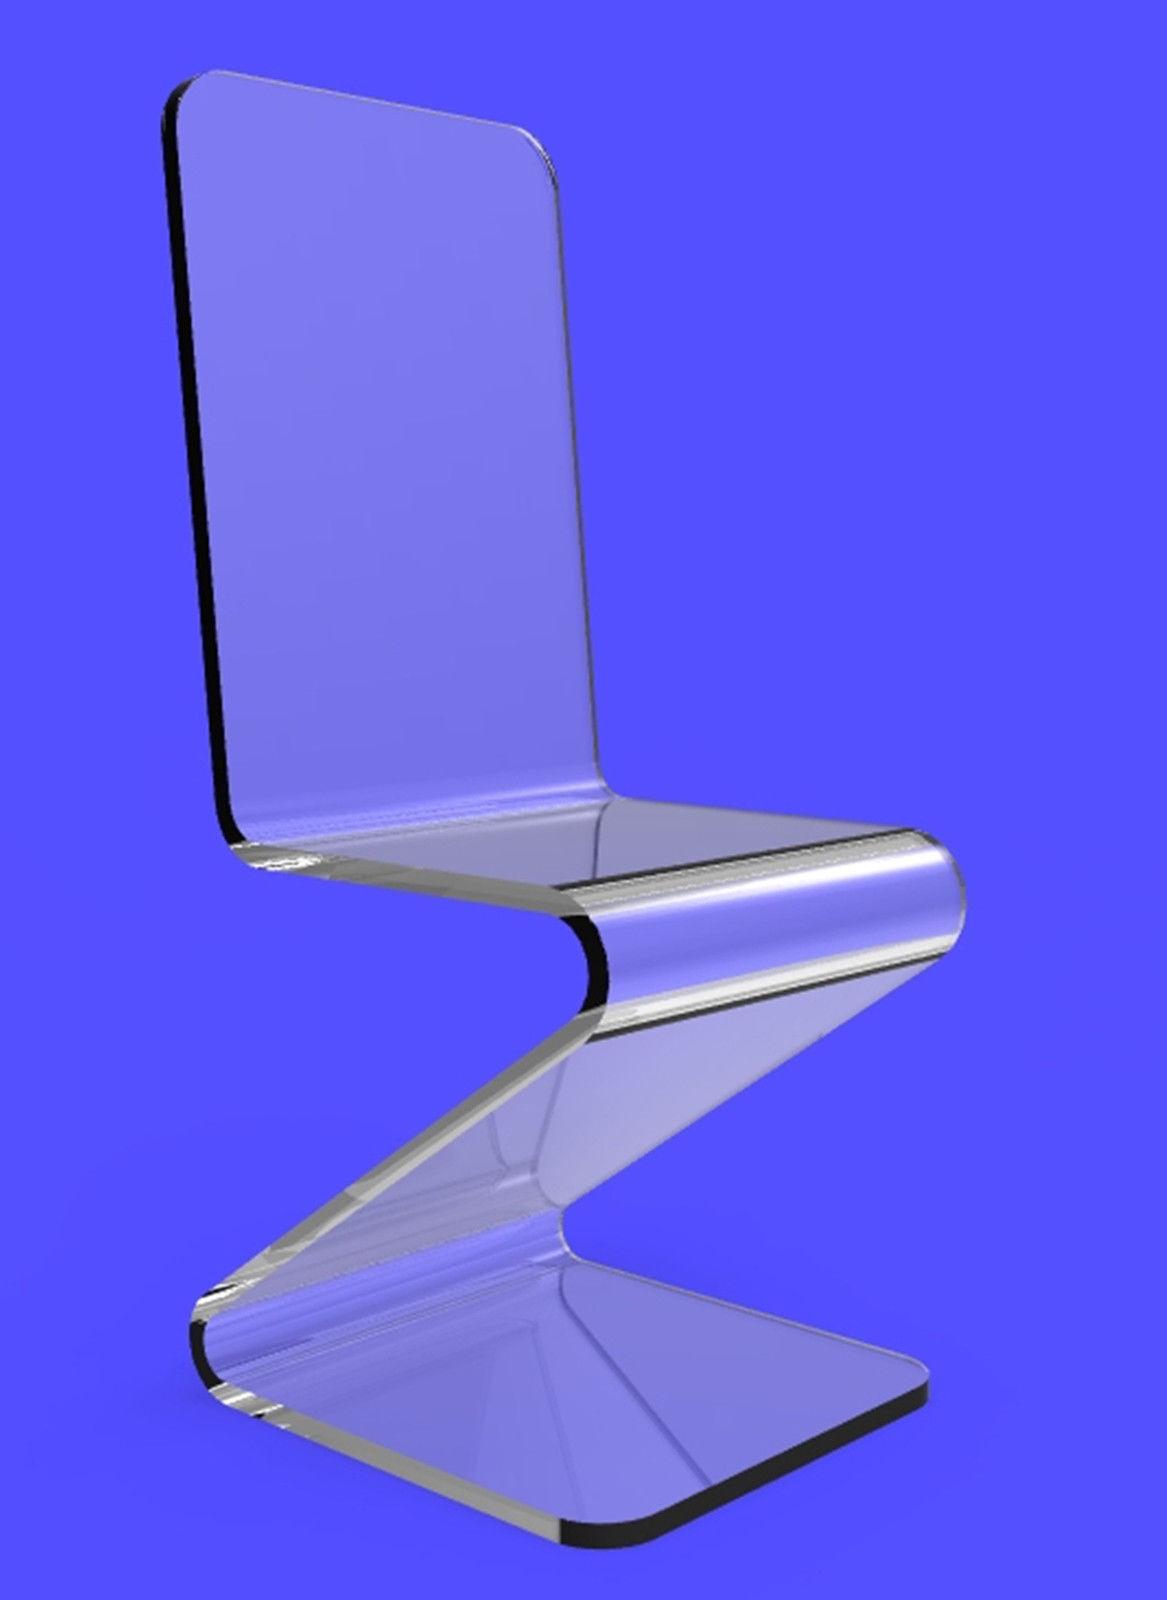 acrylic clear chair lucite plexiglass perspex z chair chairs